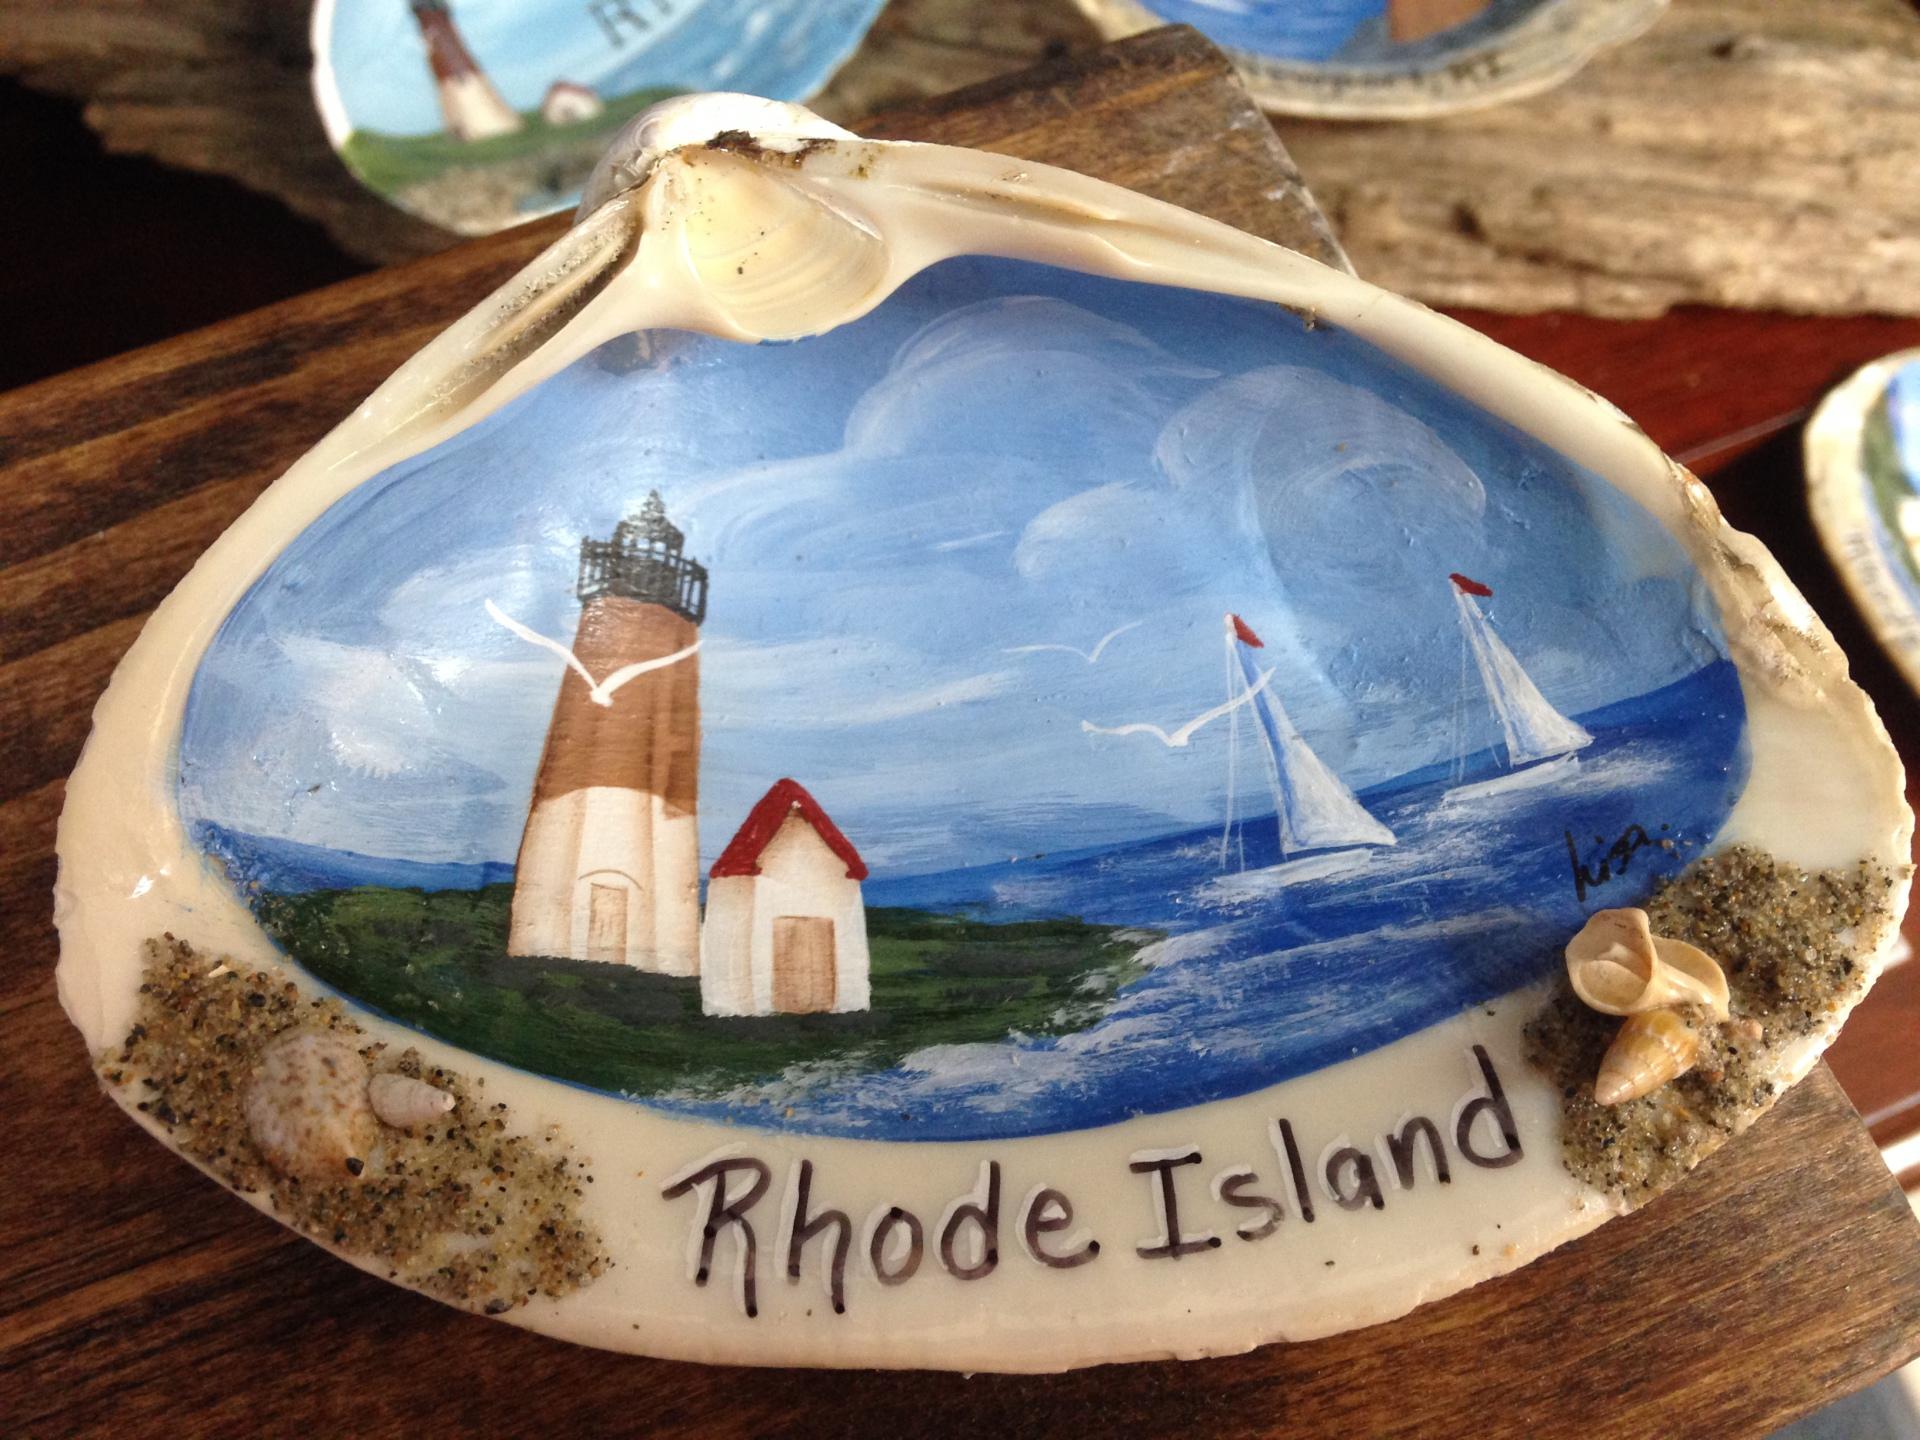 Rhode Island Souvenirs